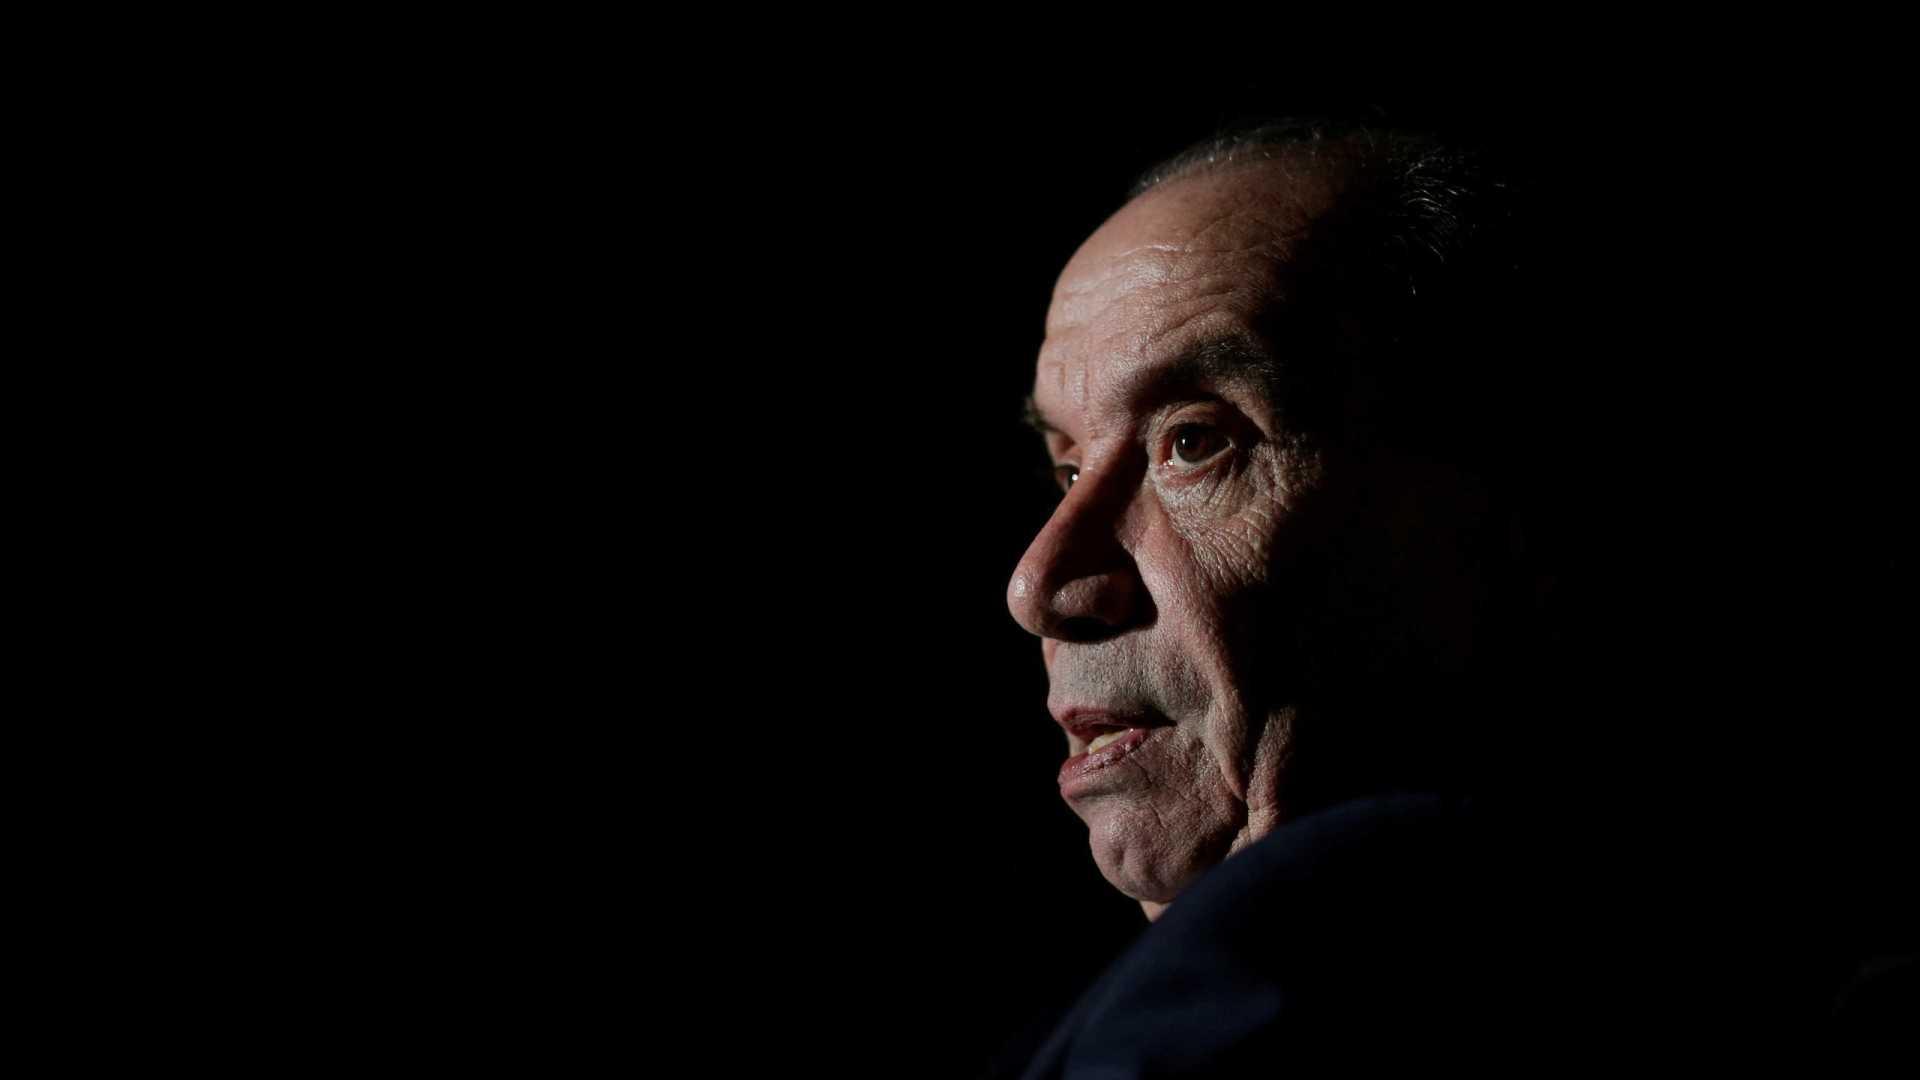 Dodge identifica repasse ilegal de R$ 500 mil a Aloysio Nunes